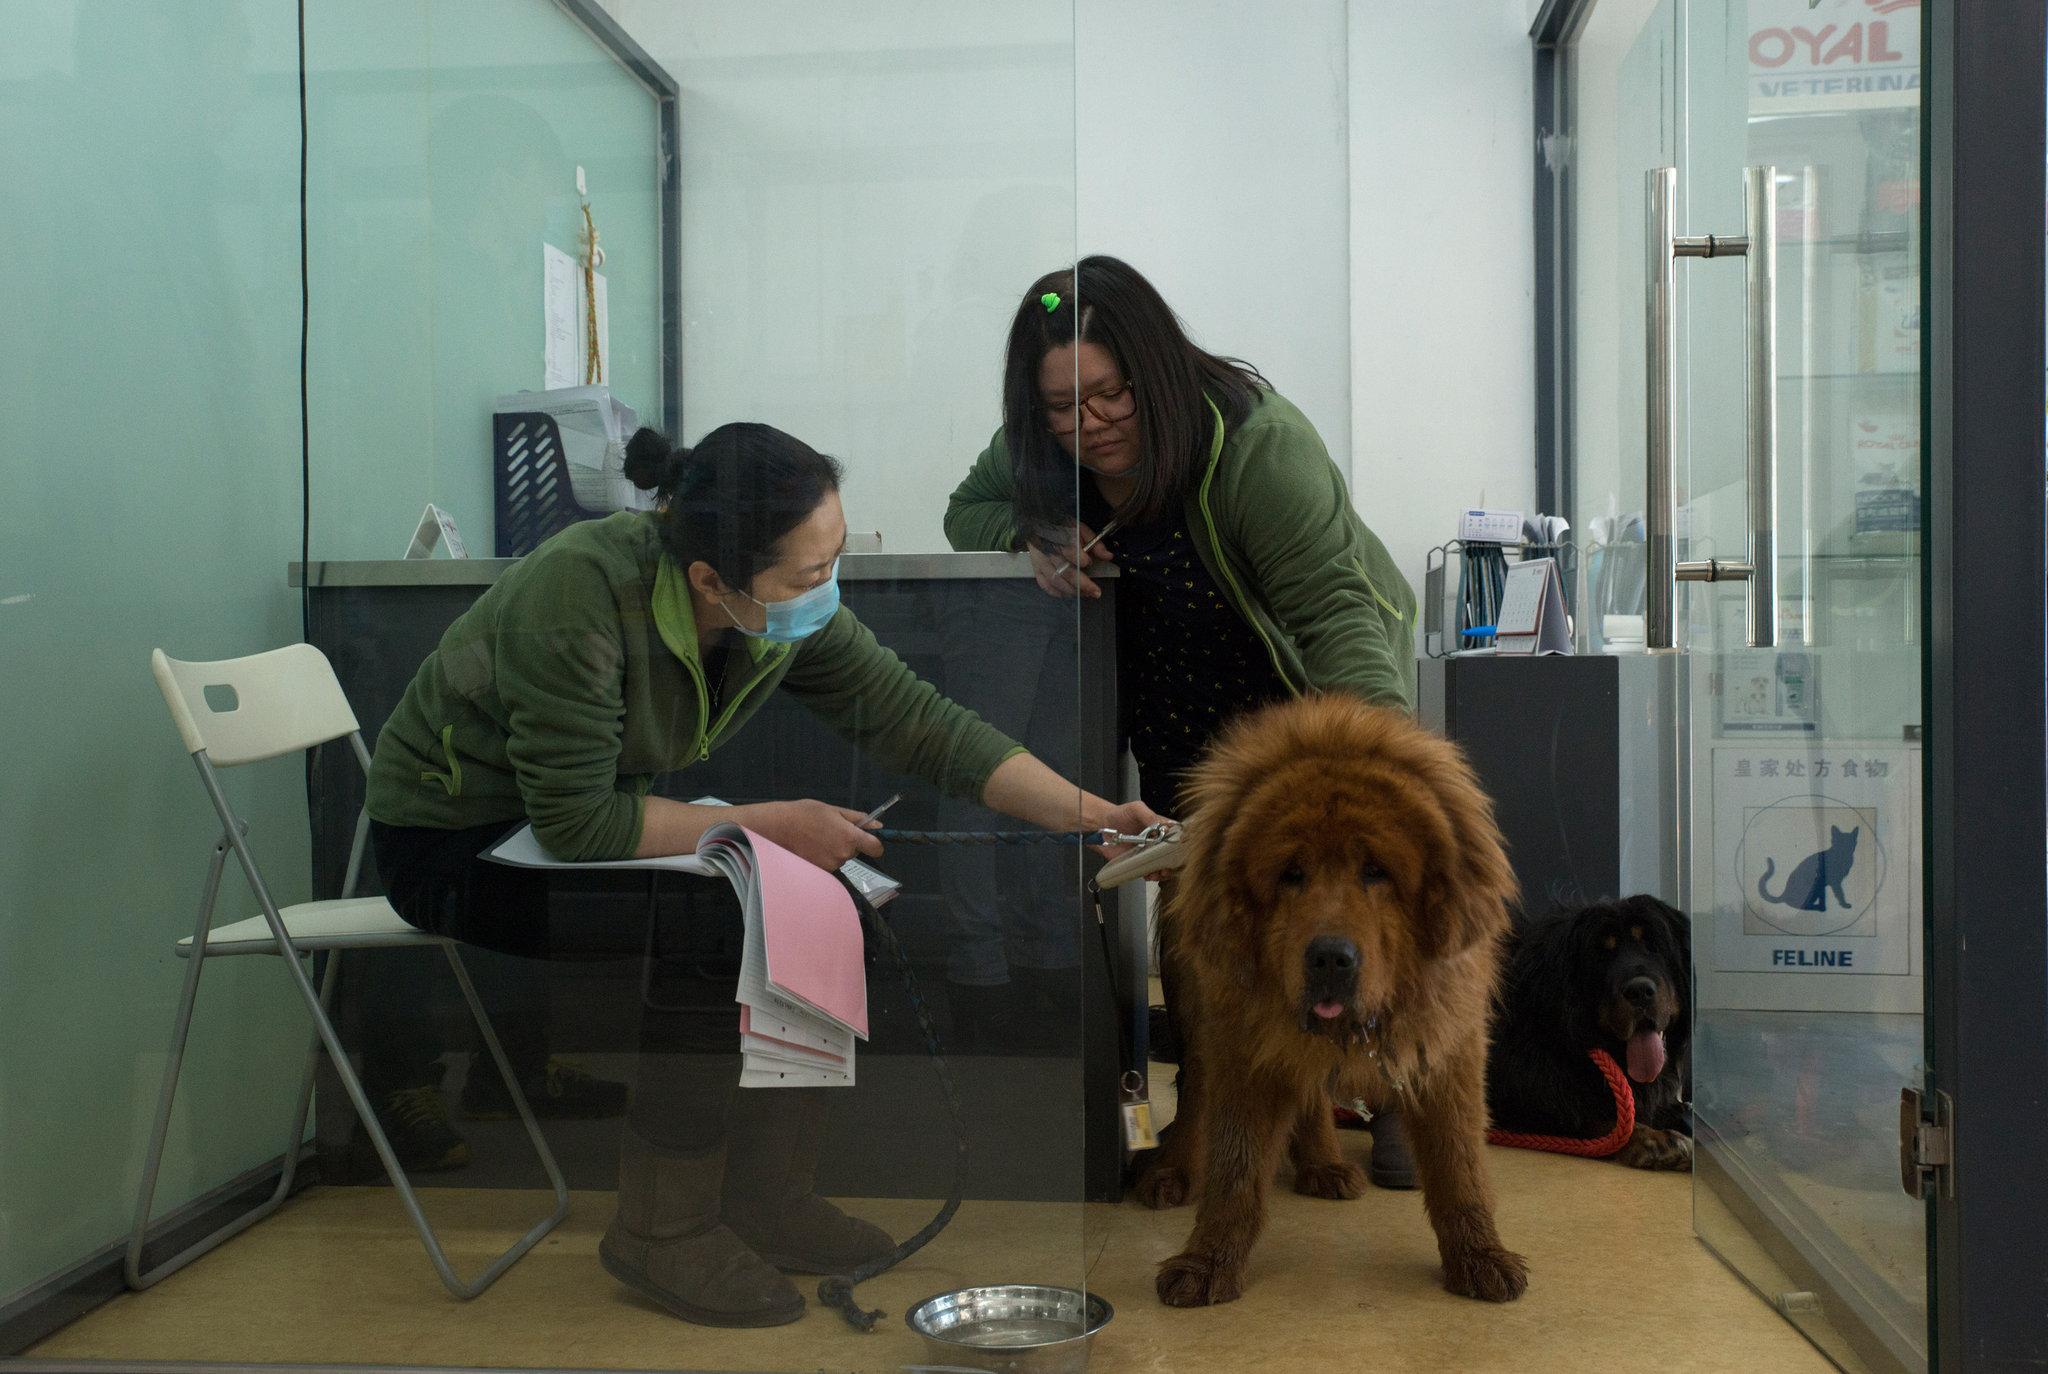 tibetan mastiff nibble ny times gilles sabre 2015-4-17